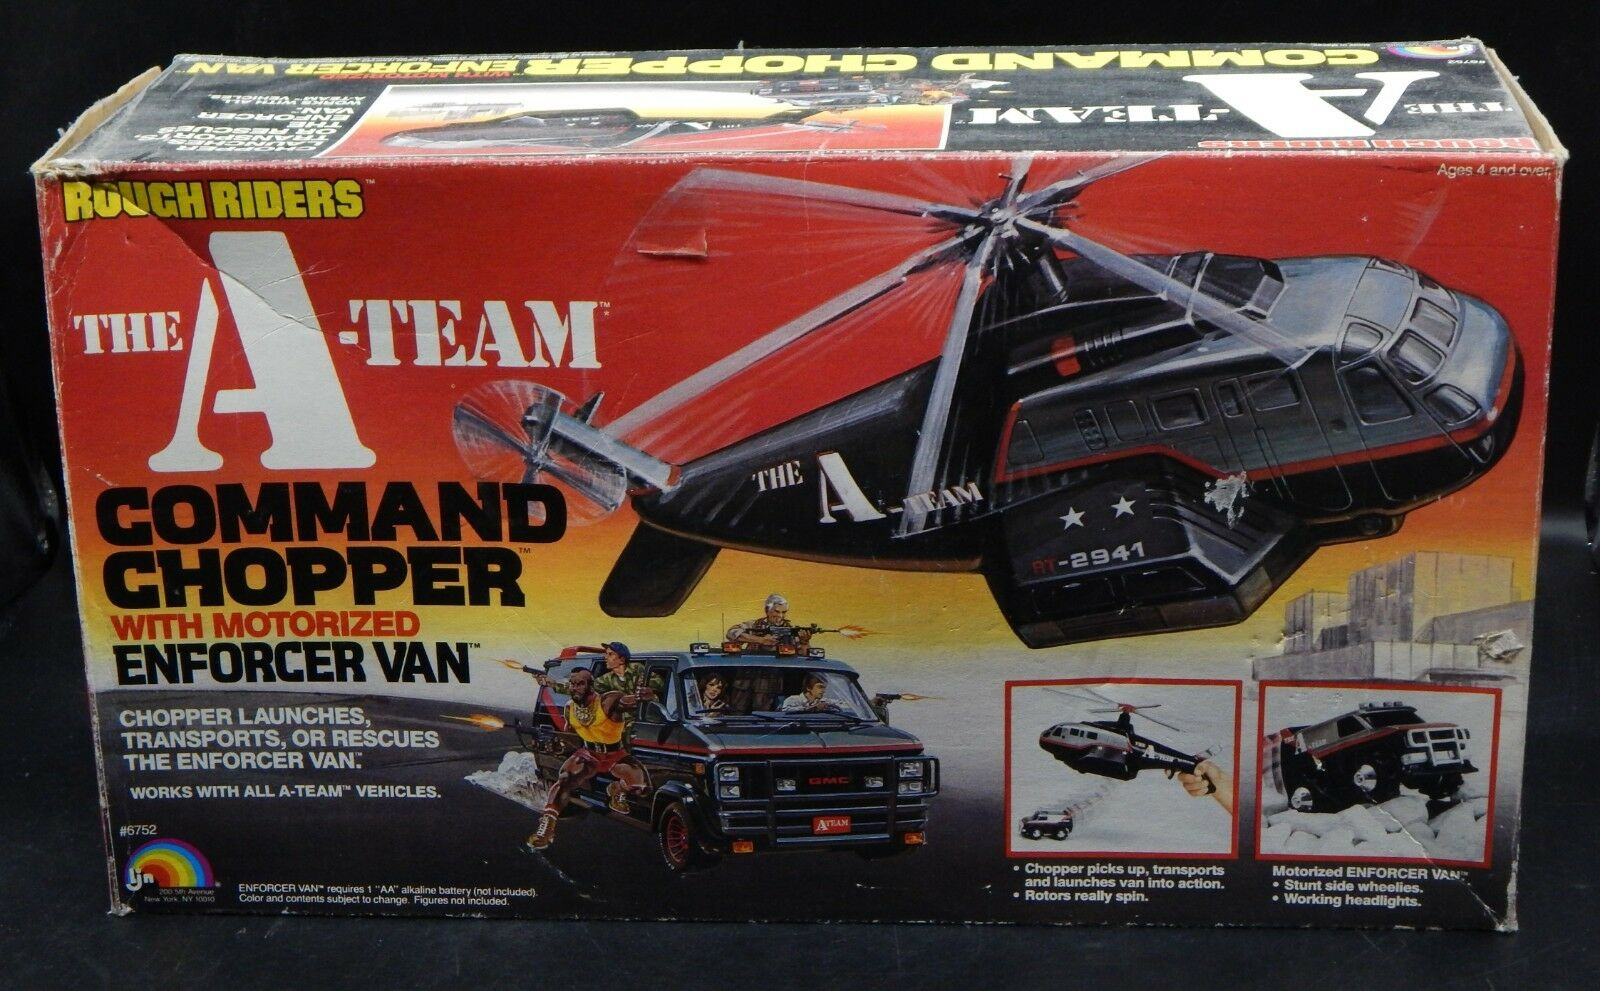 1983 LJN the A-TEAM Rough Riders COMMAND CHOPPER w/ Enforcer Van playset RARE